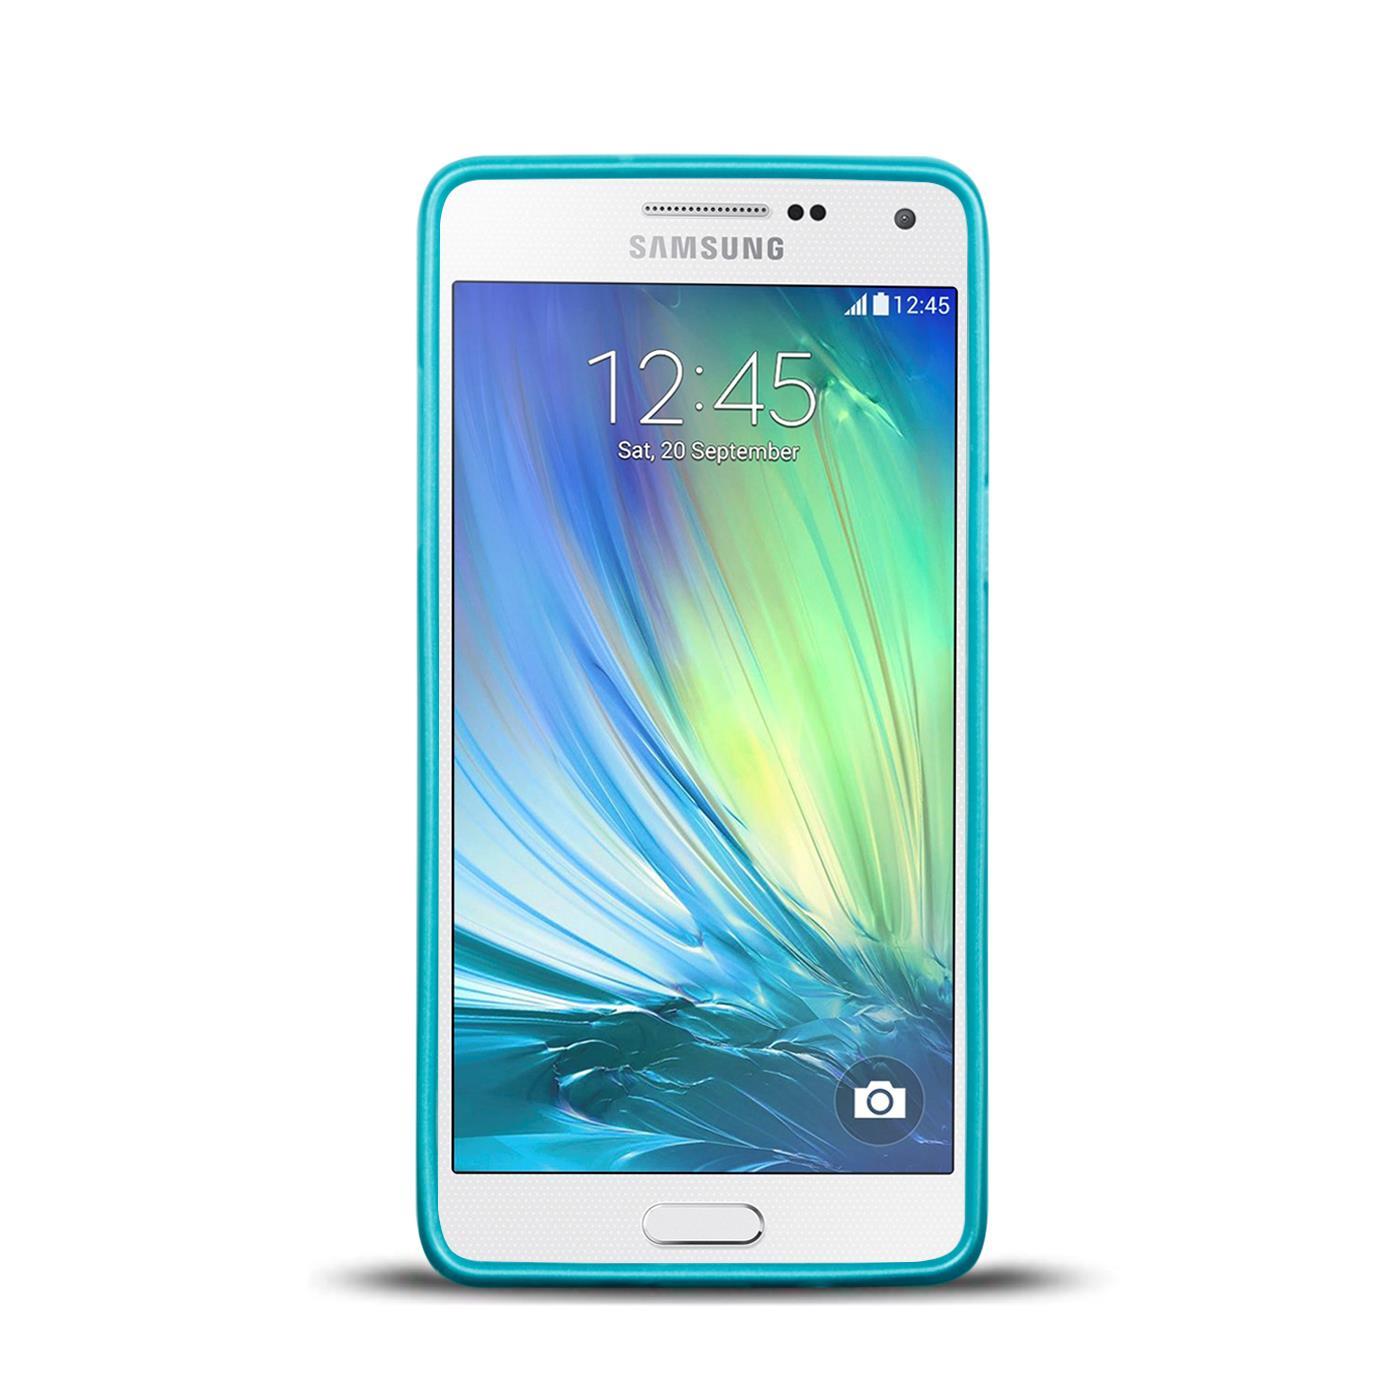 Silikon-Bumper-Case-Samsung-Galaxy-a5-2015-Ultra-Slim-Stossfeste-Rueckschale Indexbild 7